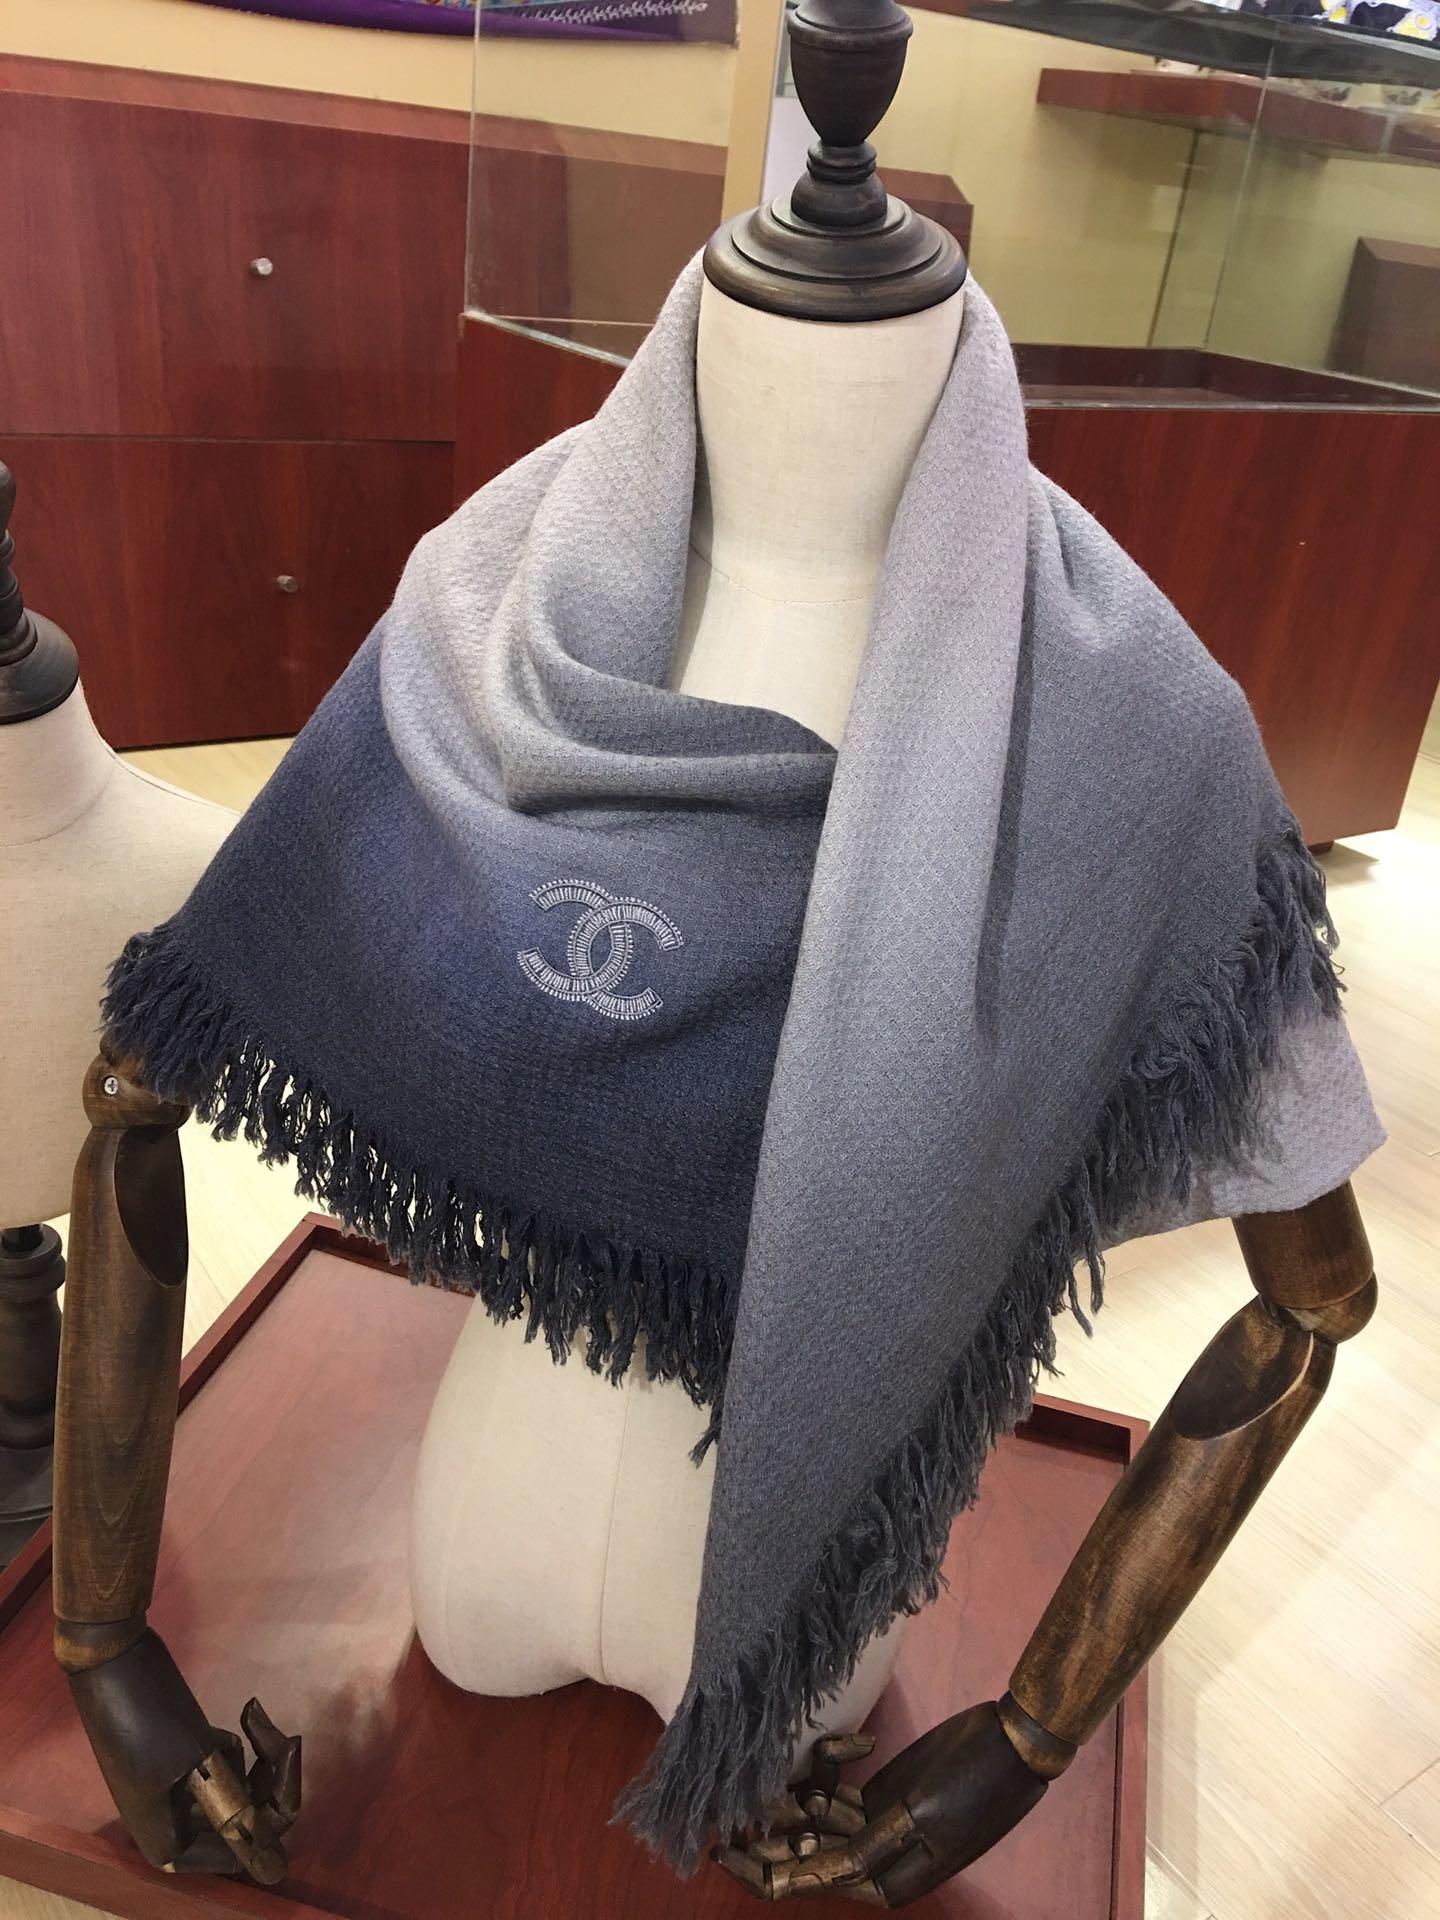 Cheap Replica Chanel Women Scarf 0016